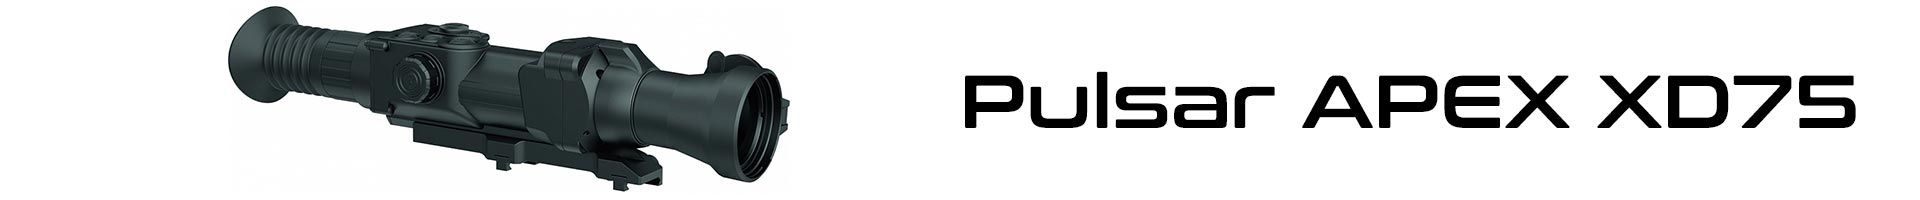 Обзор тепловизора pulsar apex xd75